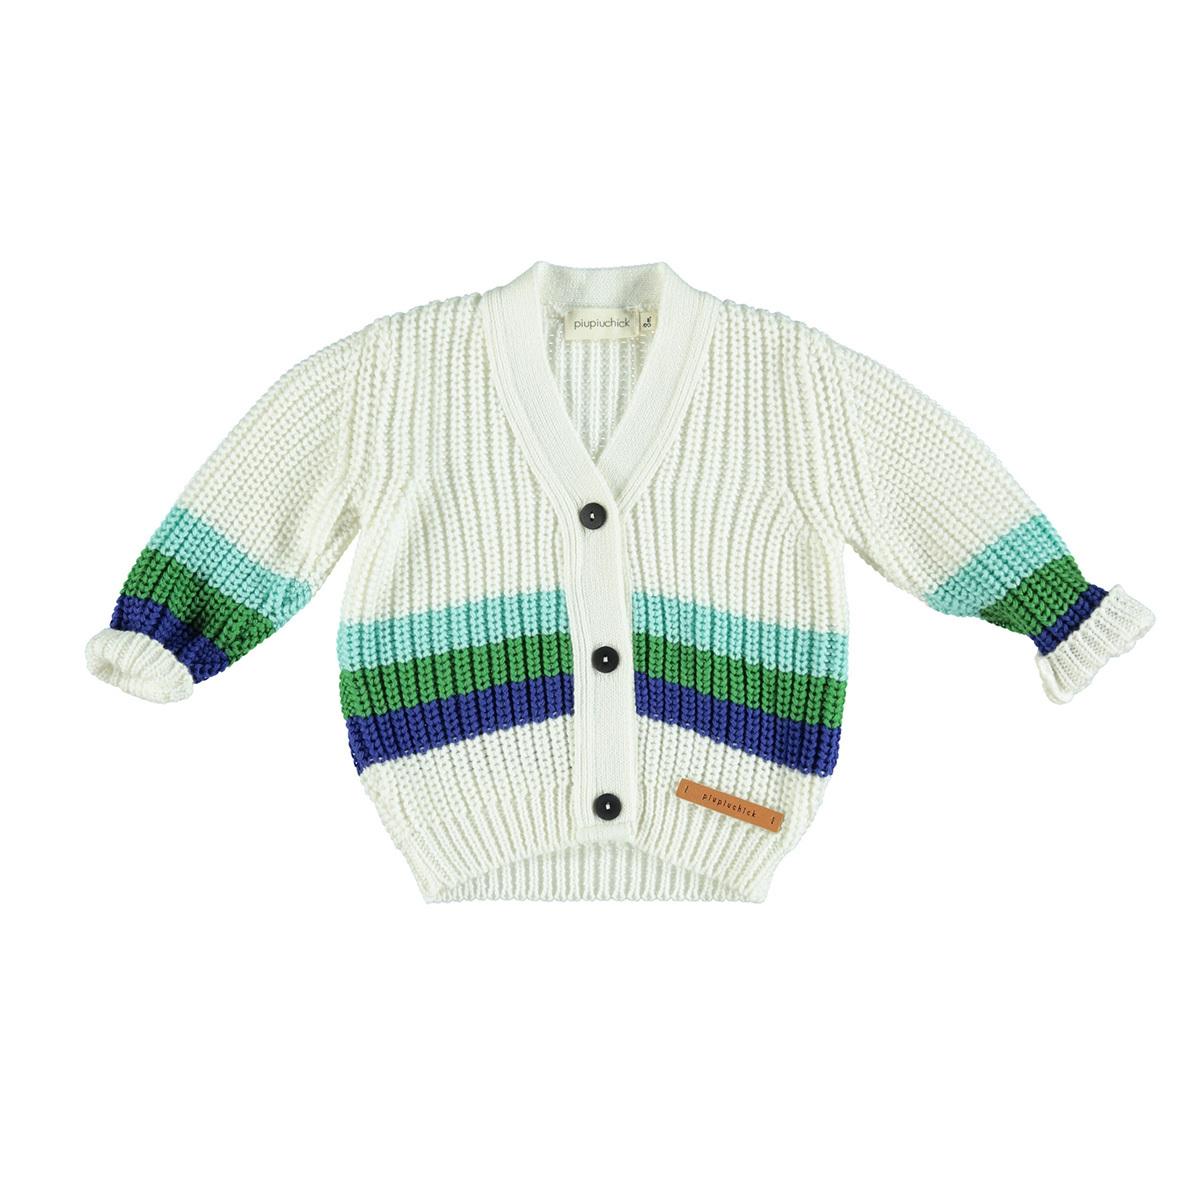 Haut bébé Gilet Ecru Rayé Vert et Bleu - 24 Mois Piupiuchick - AR201810010168